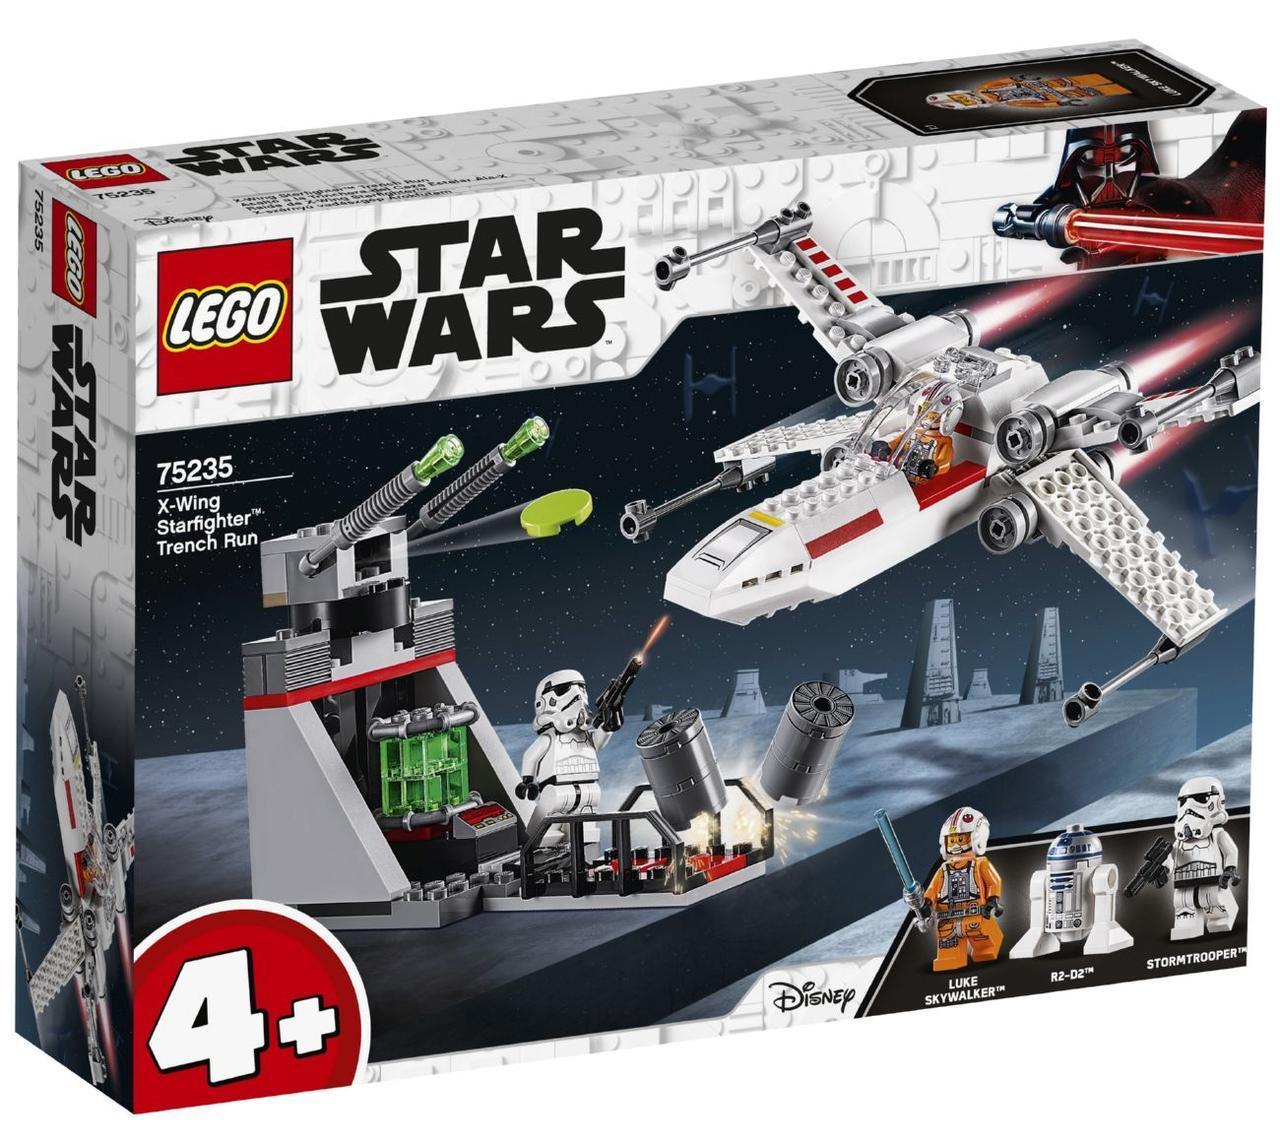 Lego Star Wars Звёздный истребитель типа Х 75235